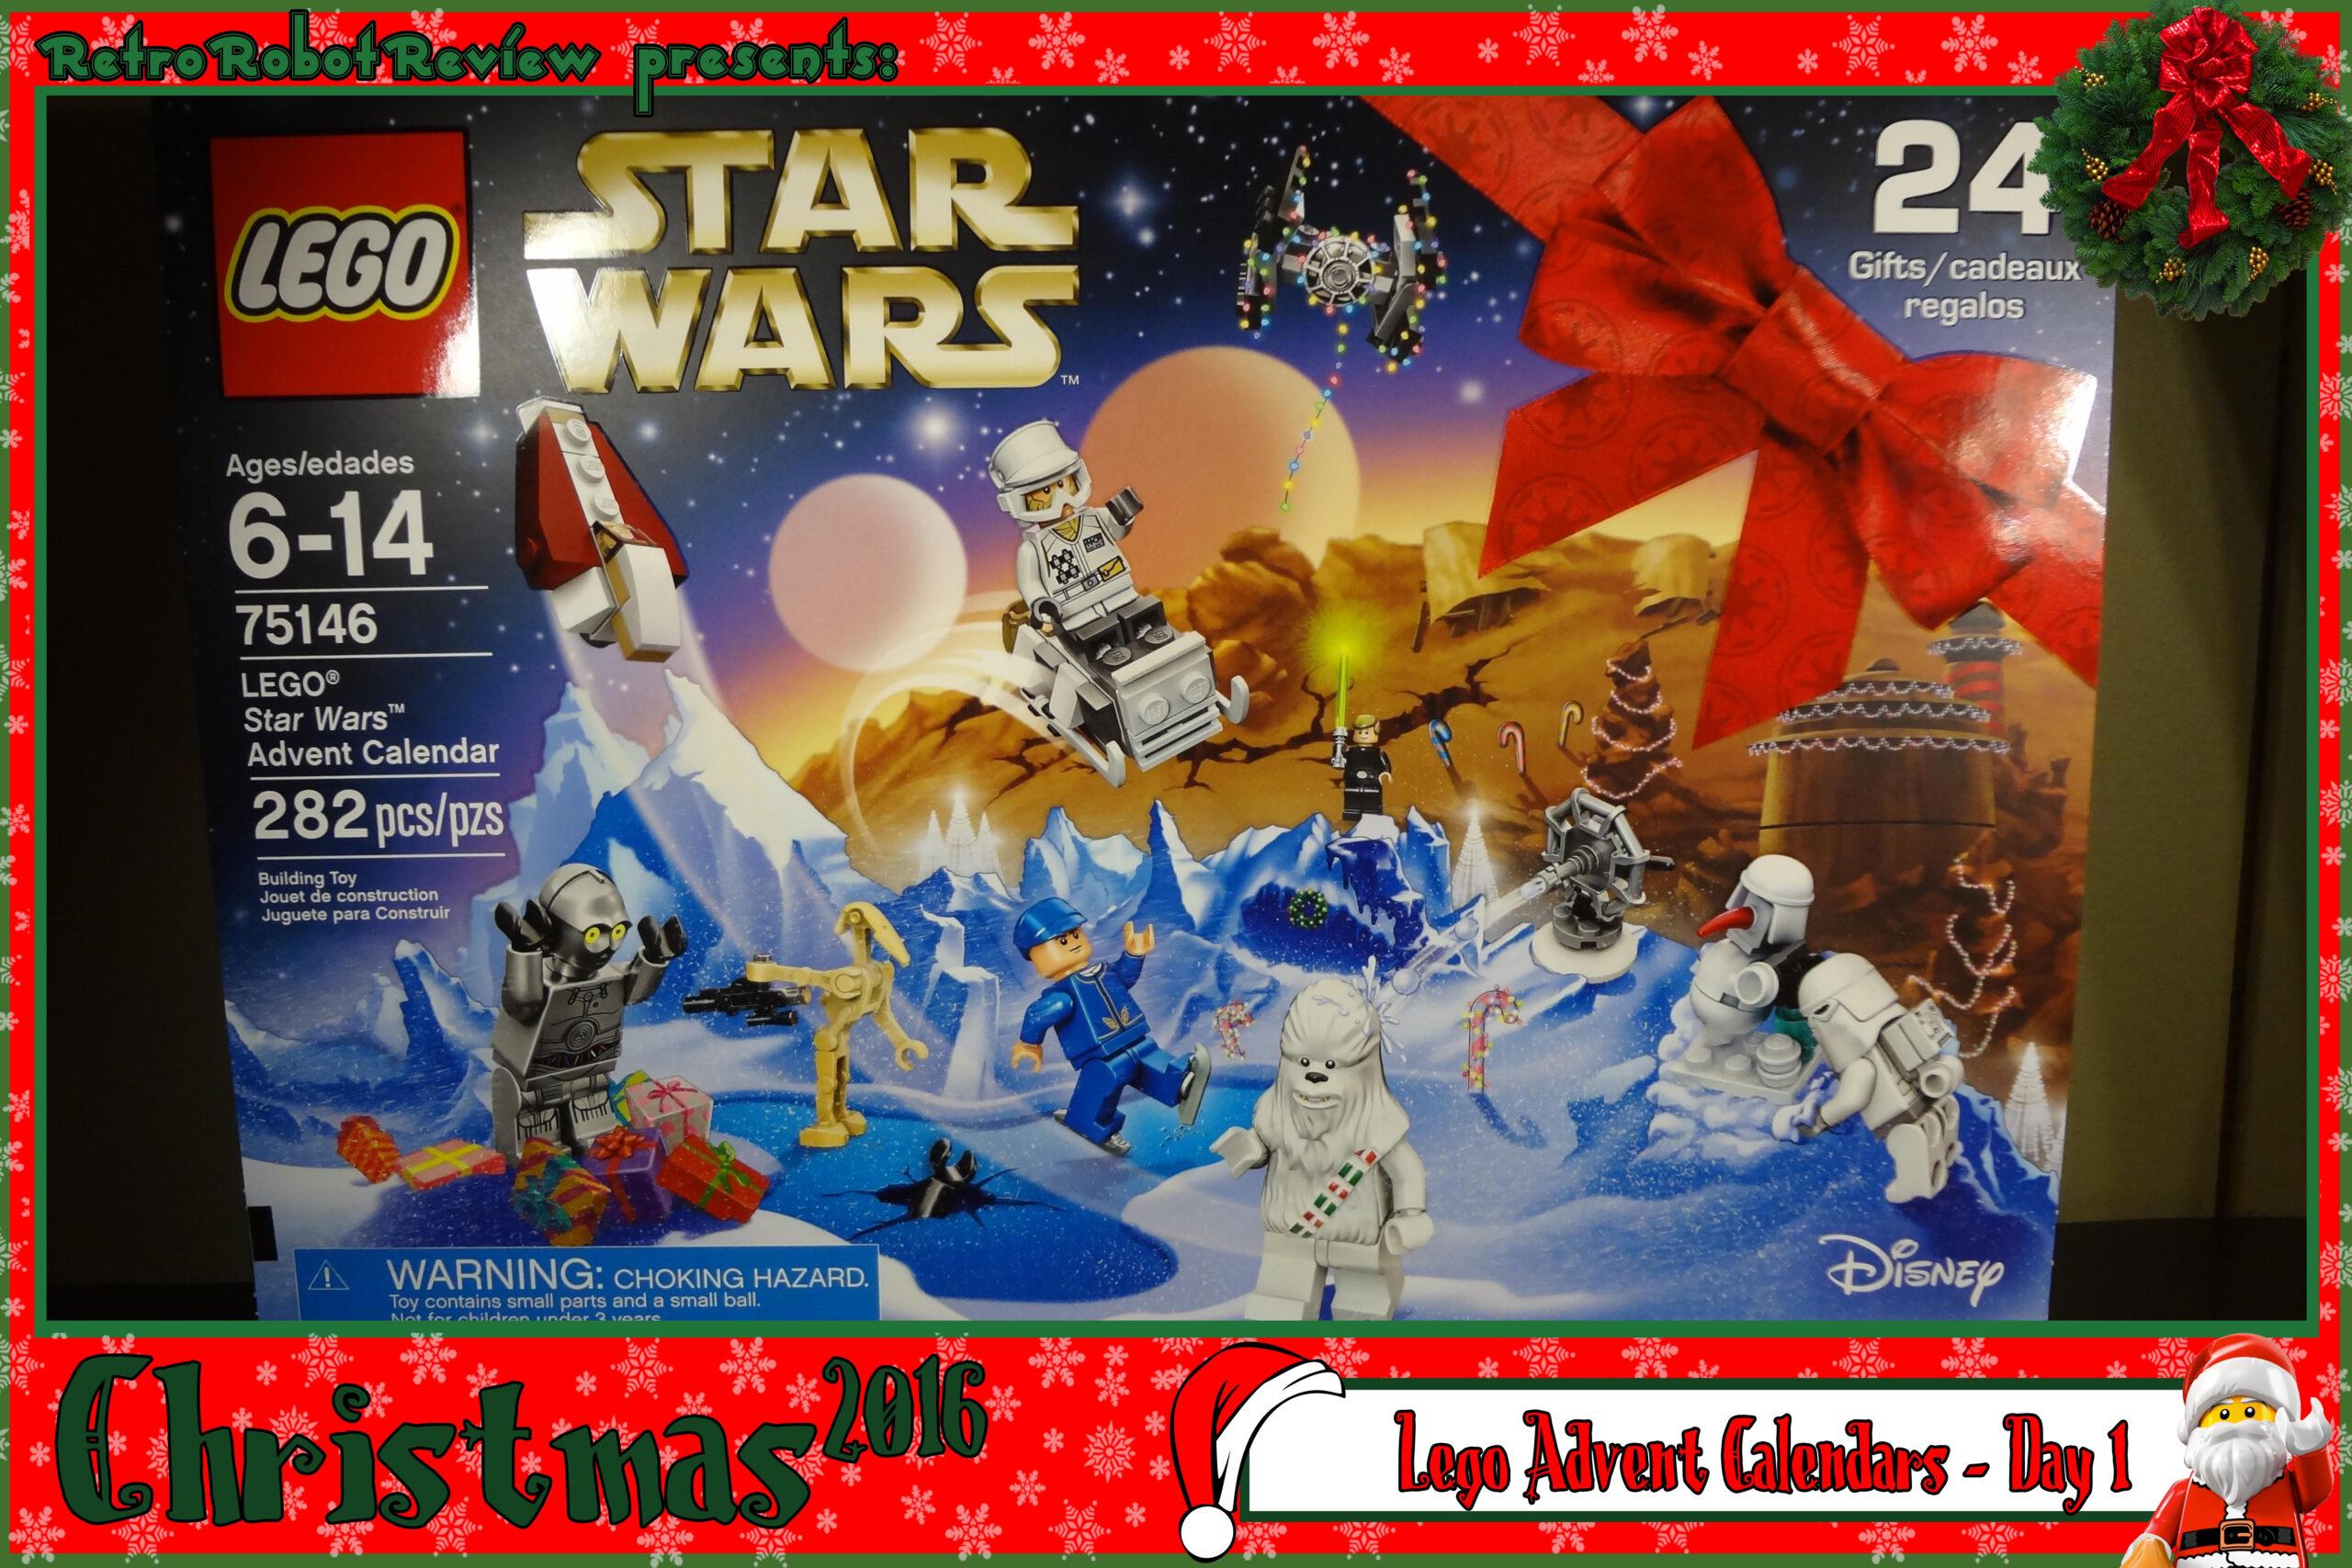 Lego Advent Calendars  Day 1 pertaining to Lego Star Wars Advent Calendar Instructions